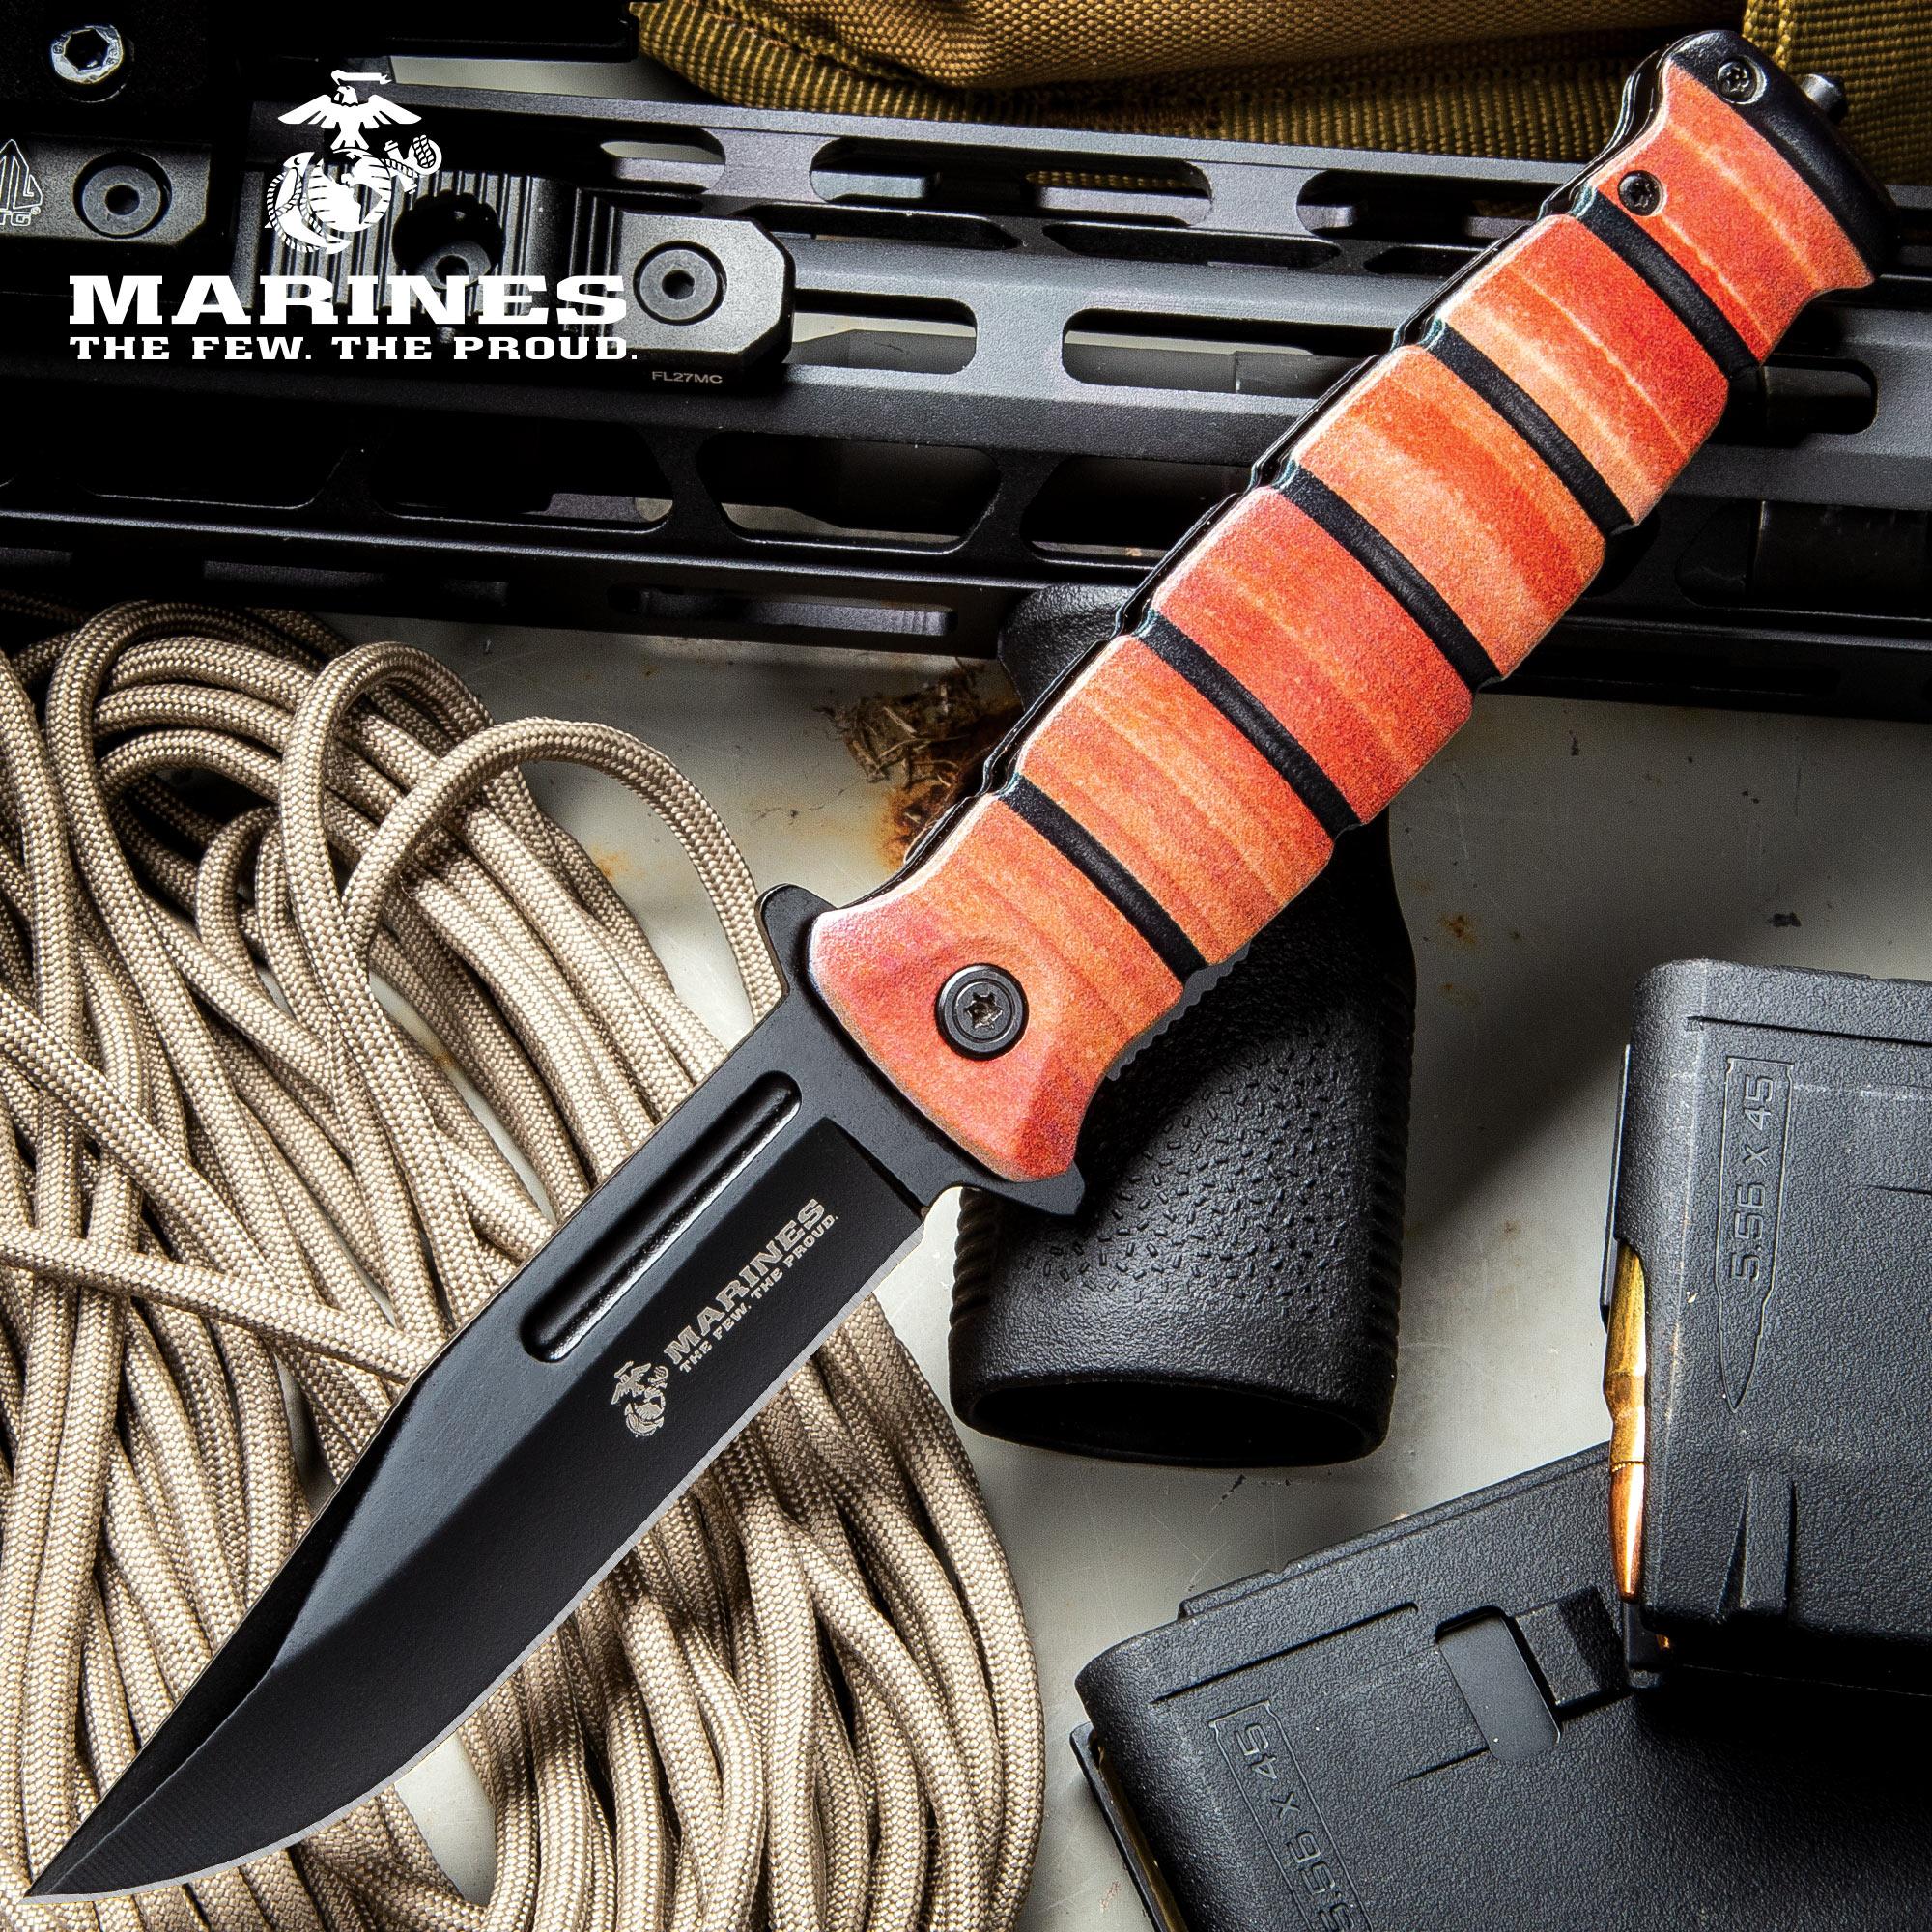 USMC Combat Fighter Pocket Knife - Stainless Steel Blade